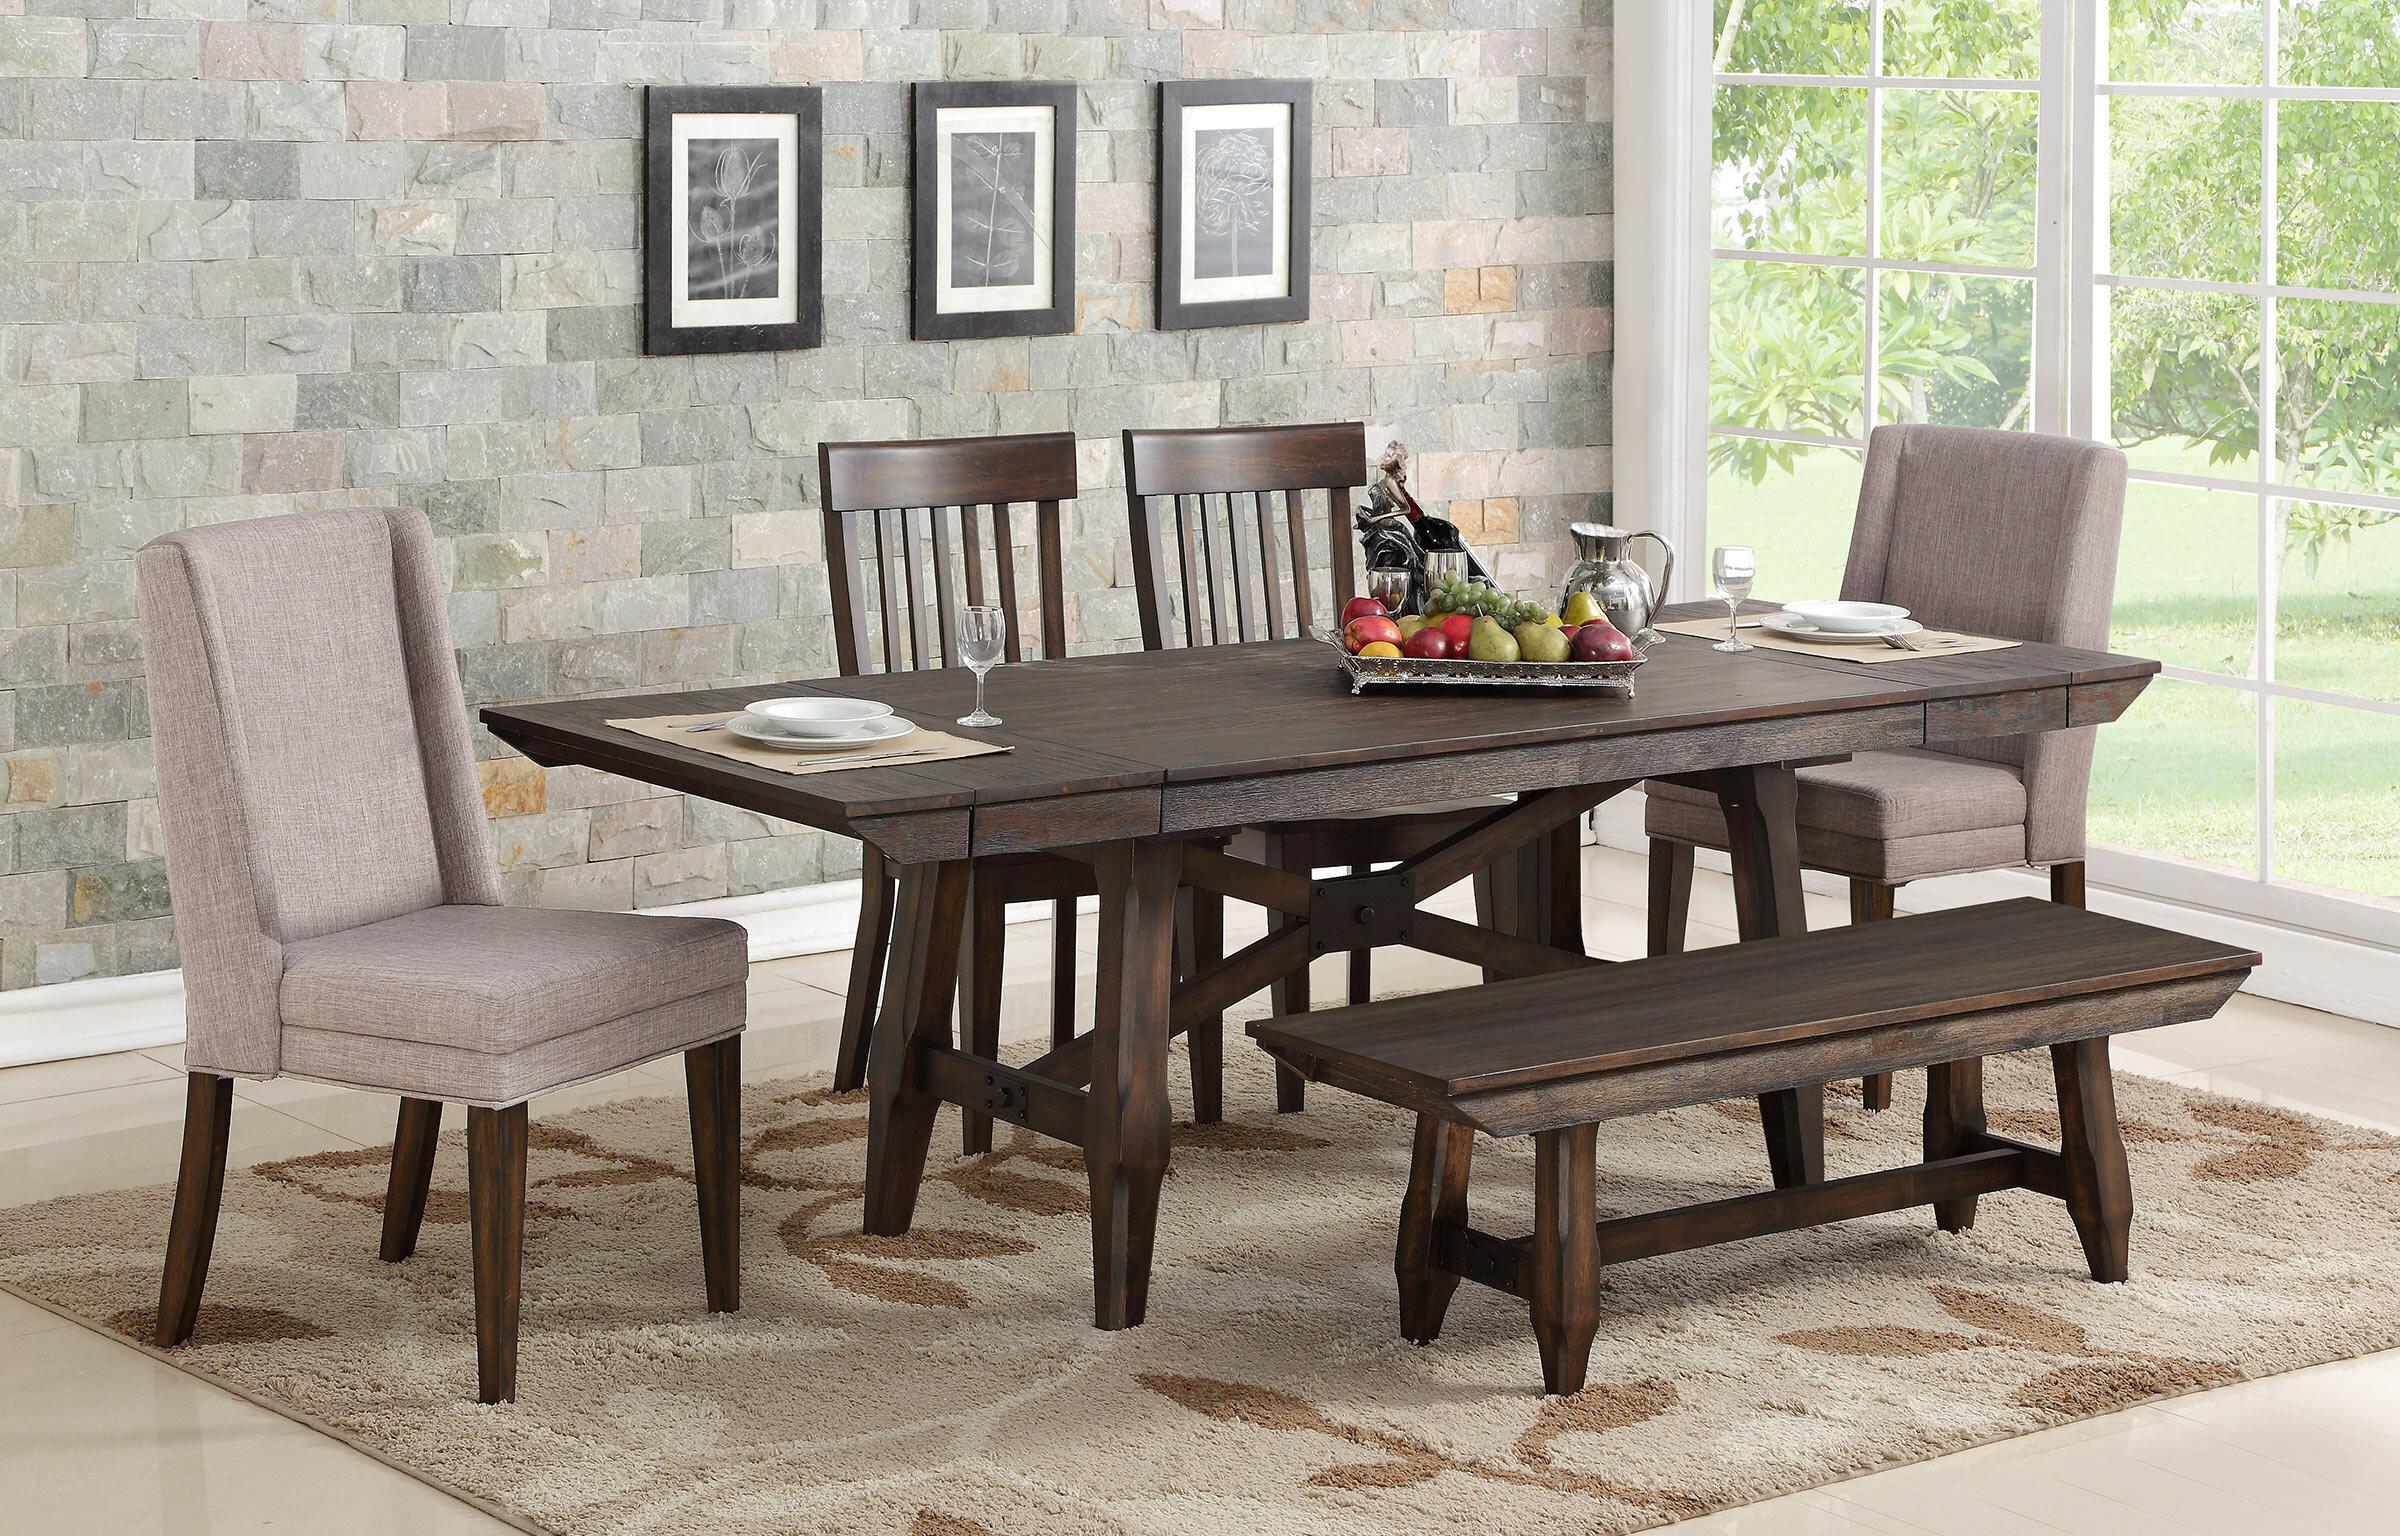 Gracie Oaks 6 Piece Extendable Solid Wood Dining Set Reviews Wayfair